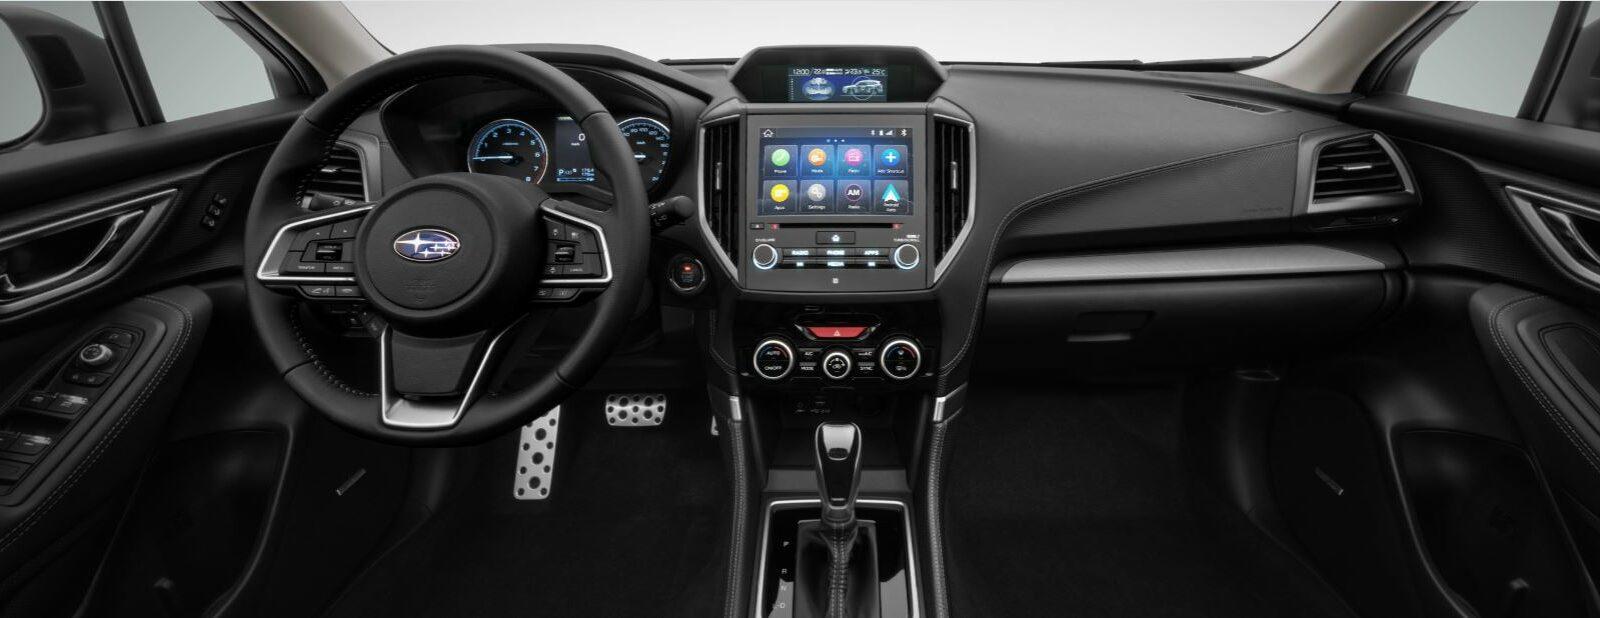 Subaru Forester 2020 interiér vozu